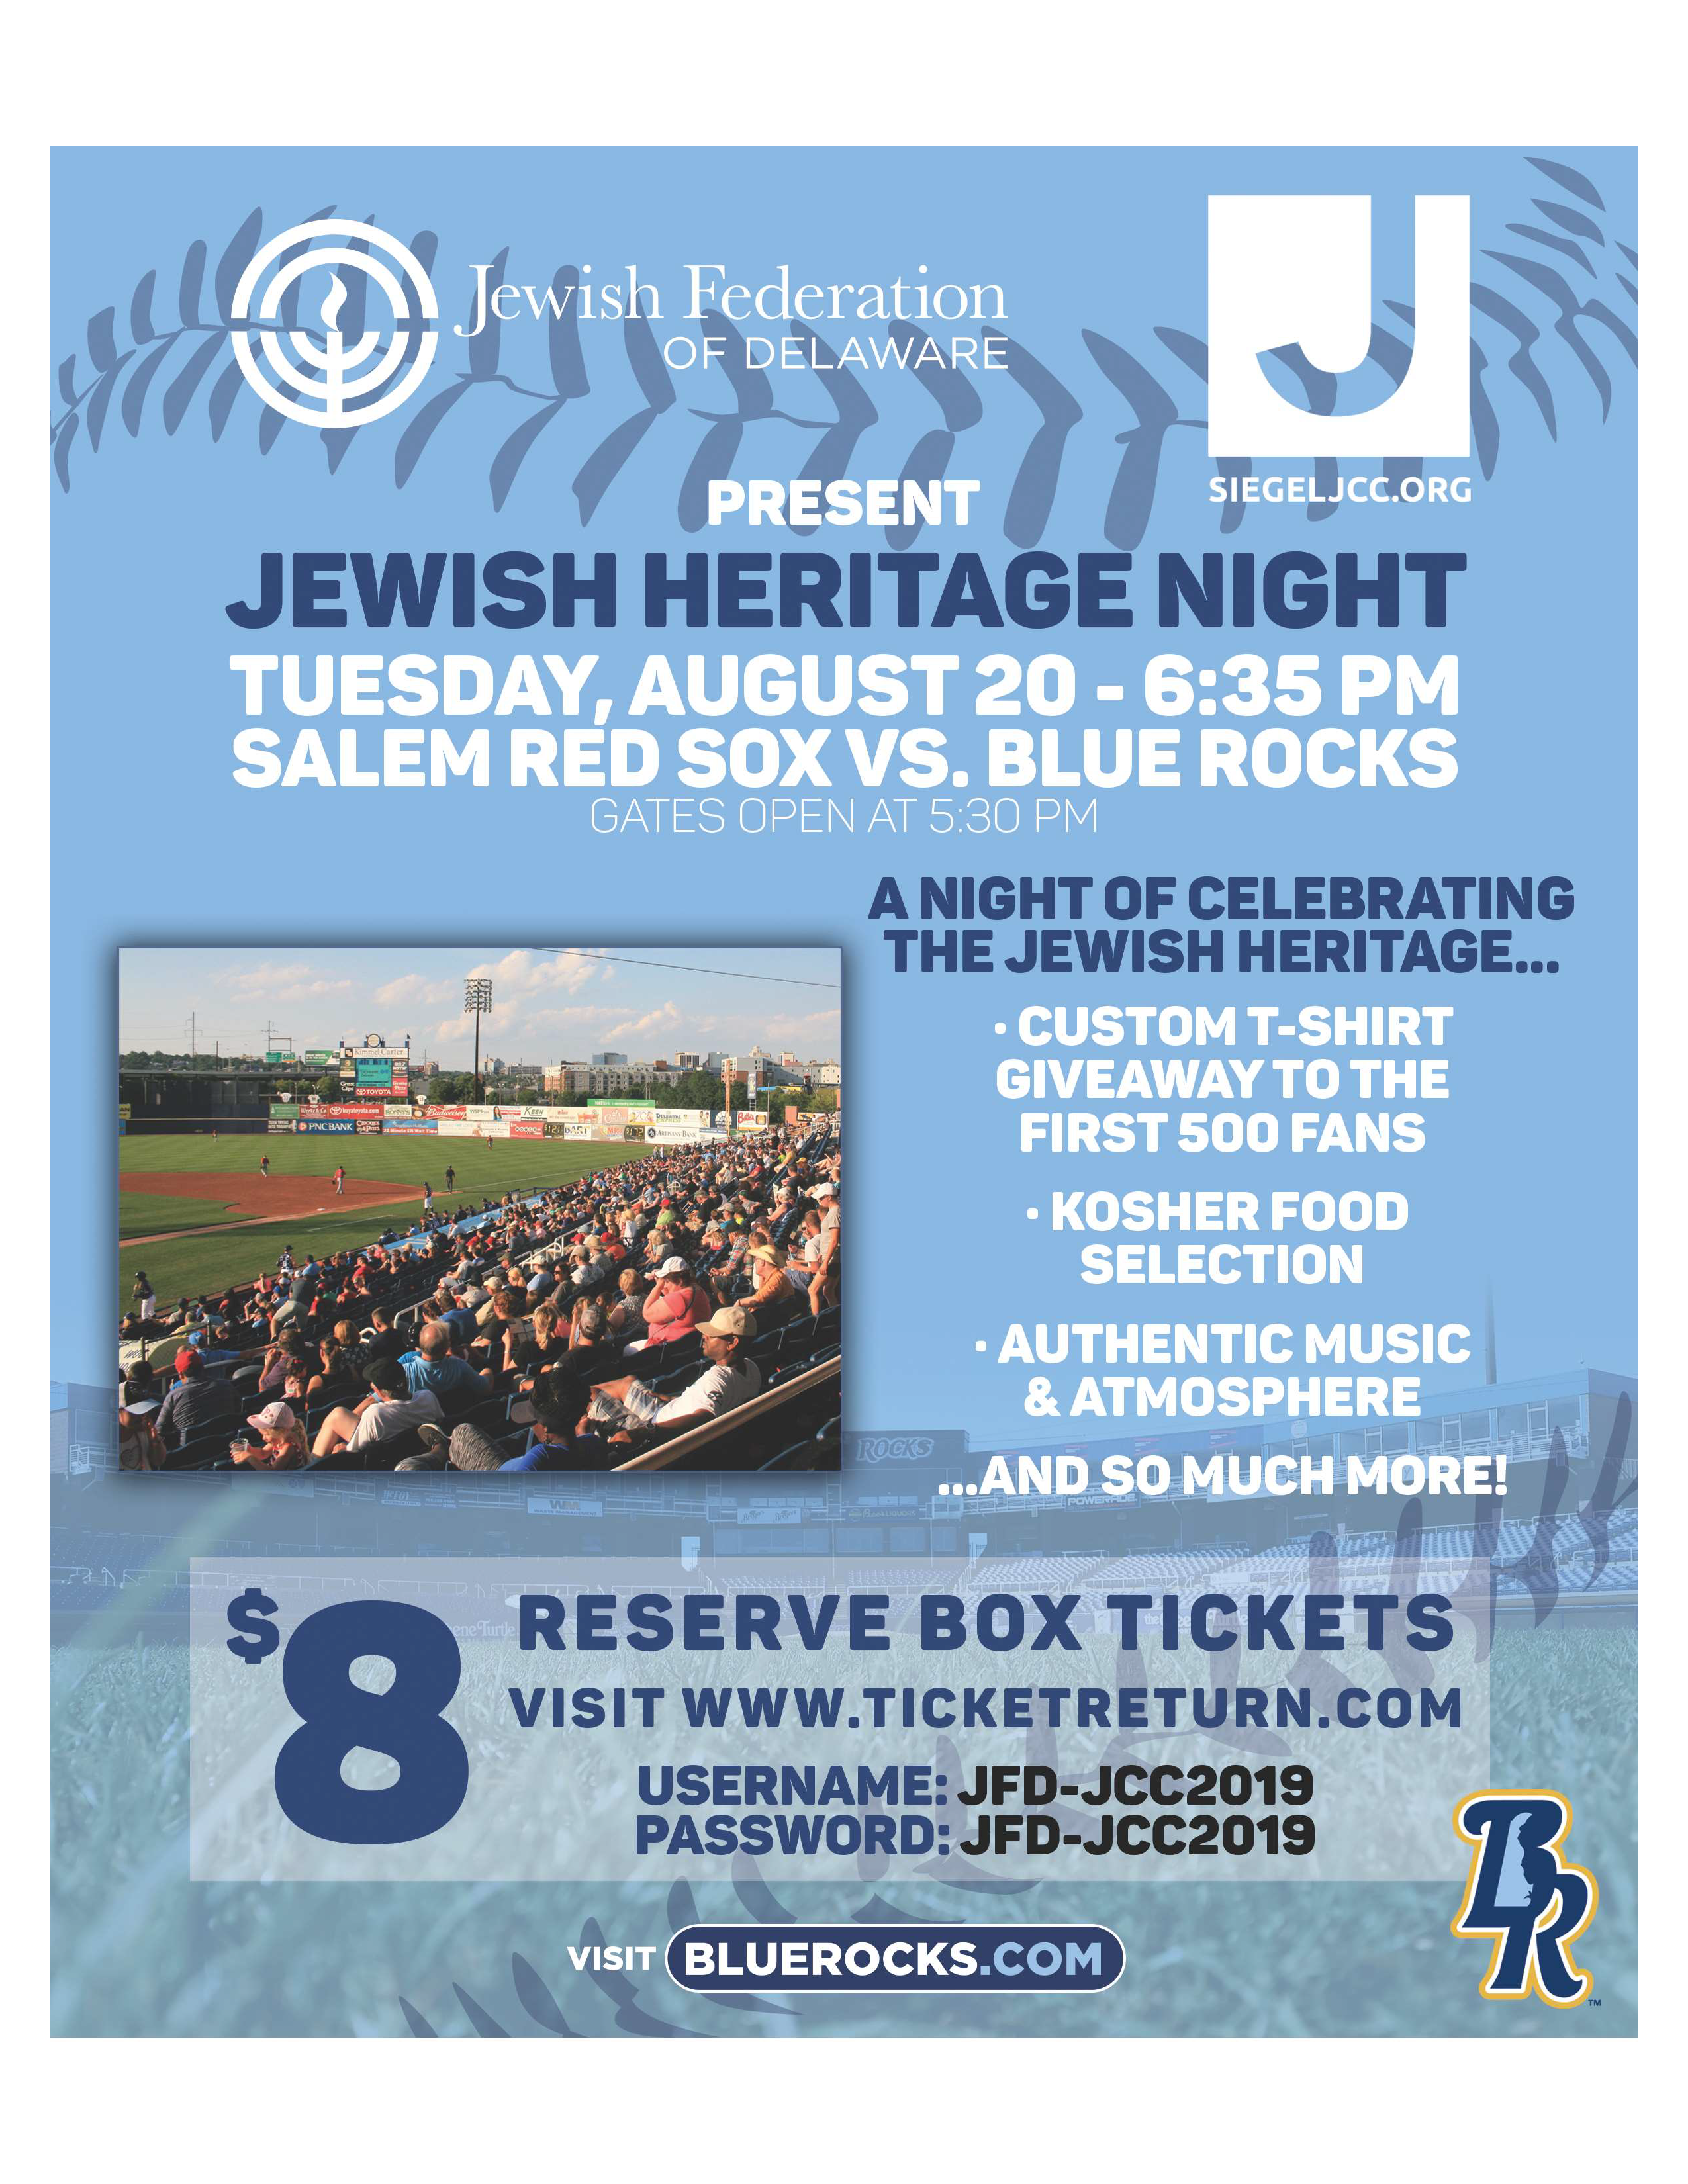 Jewish Heritage Night with the Blue Rocks